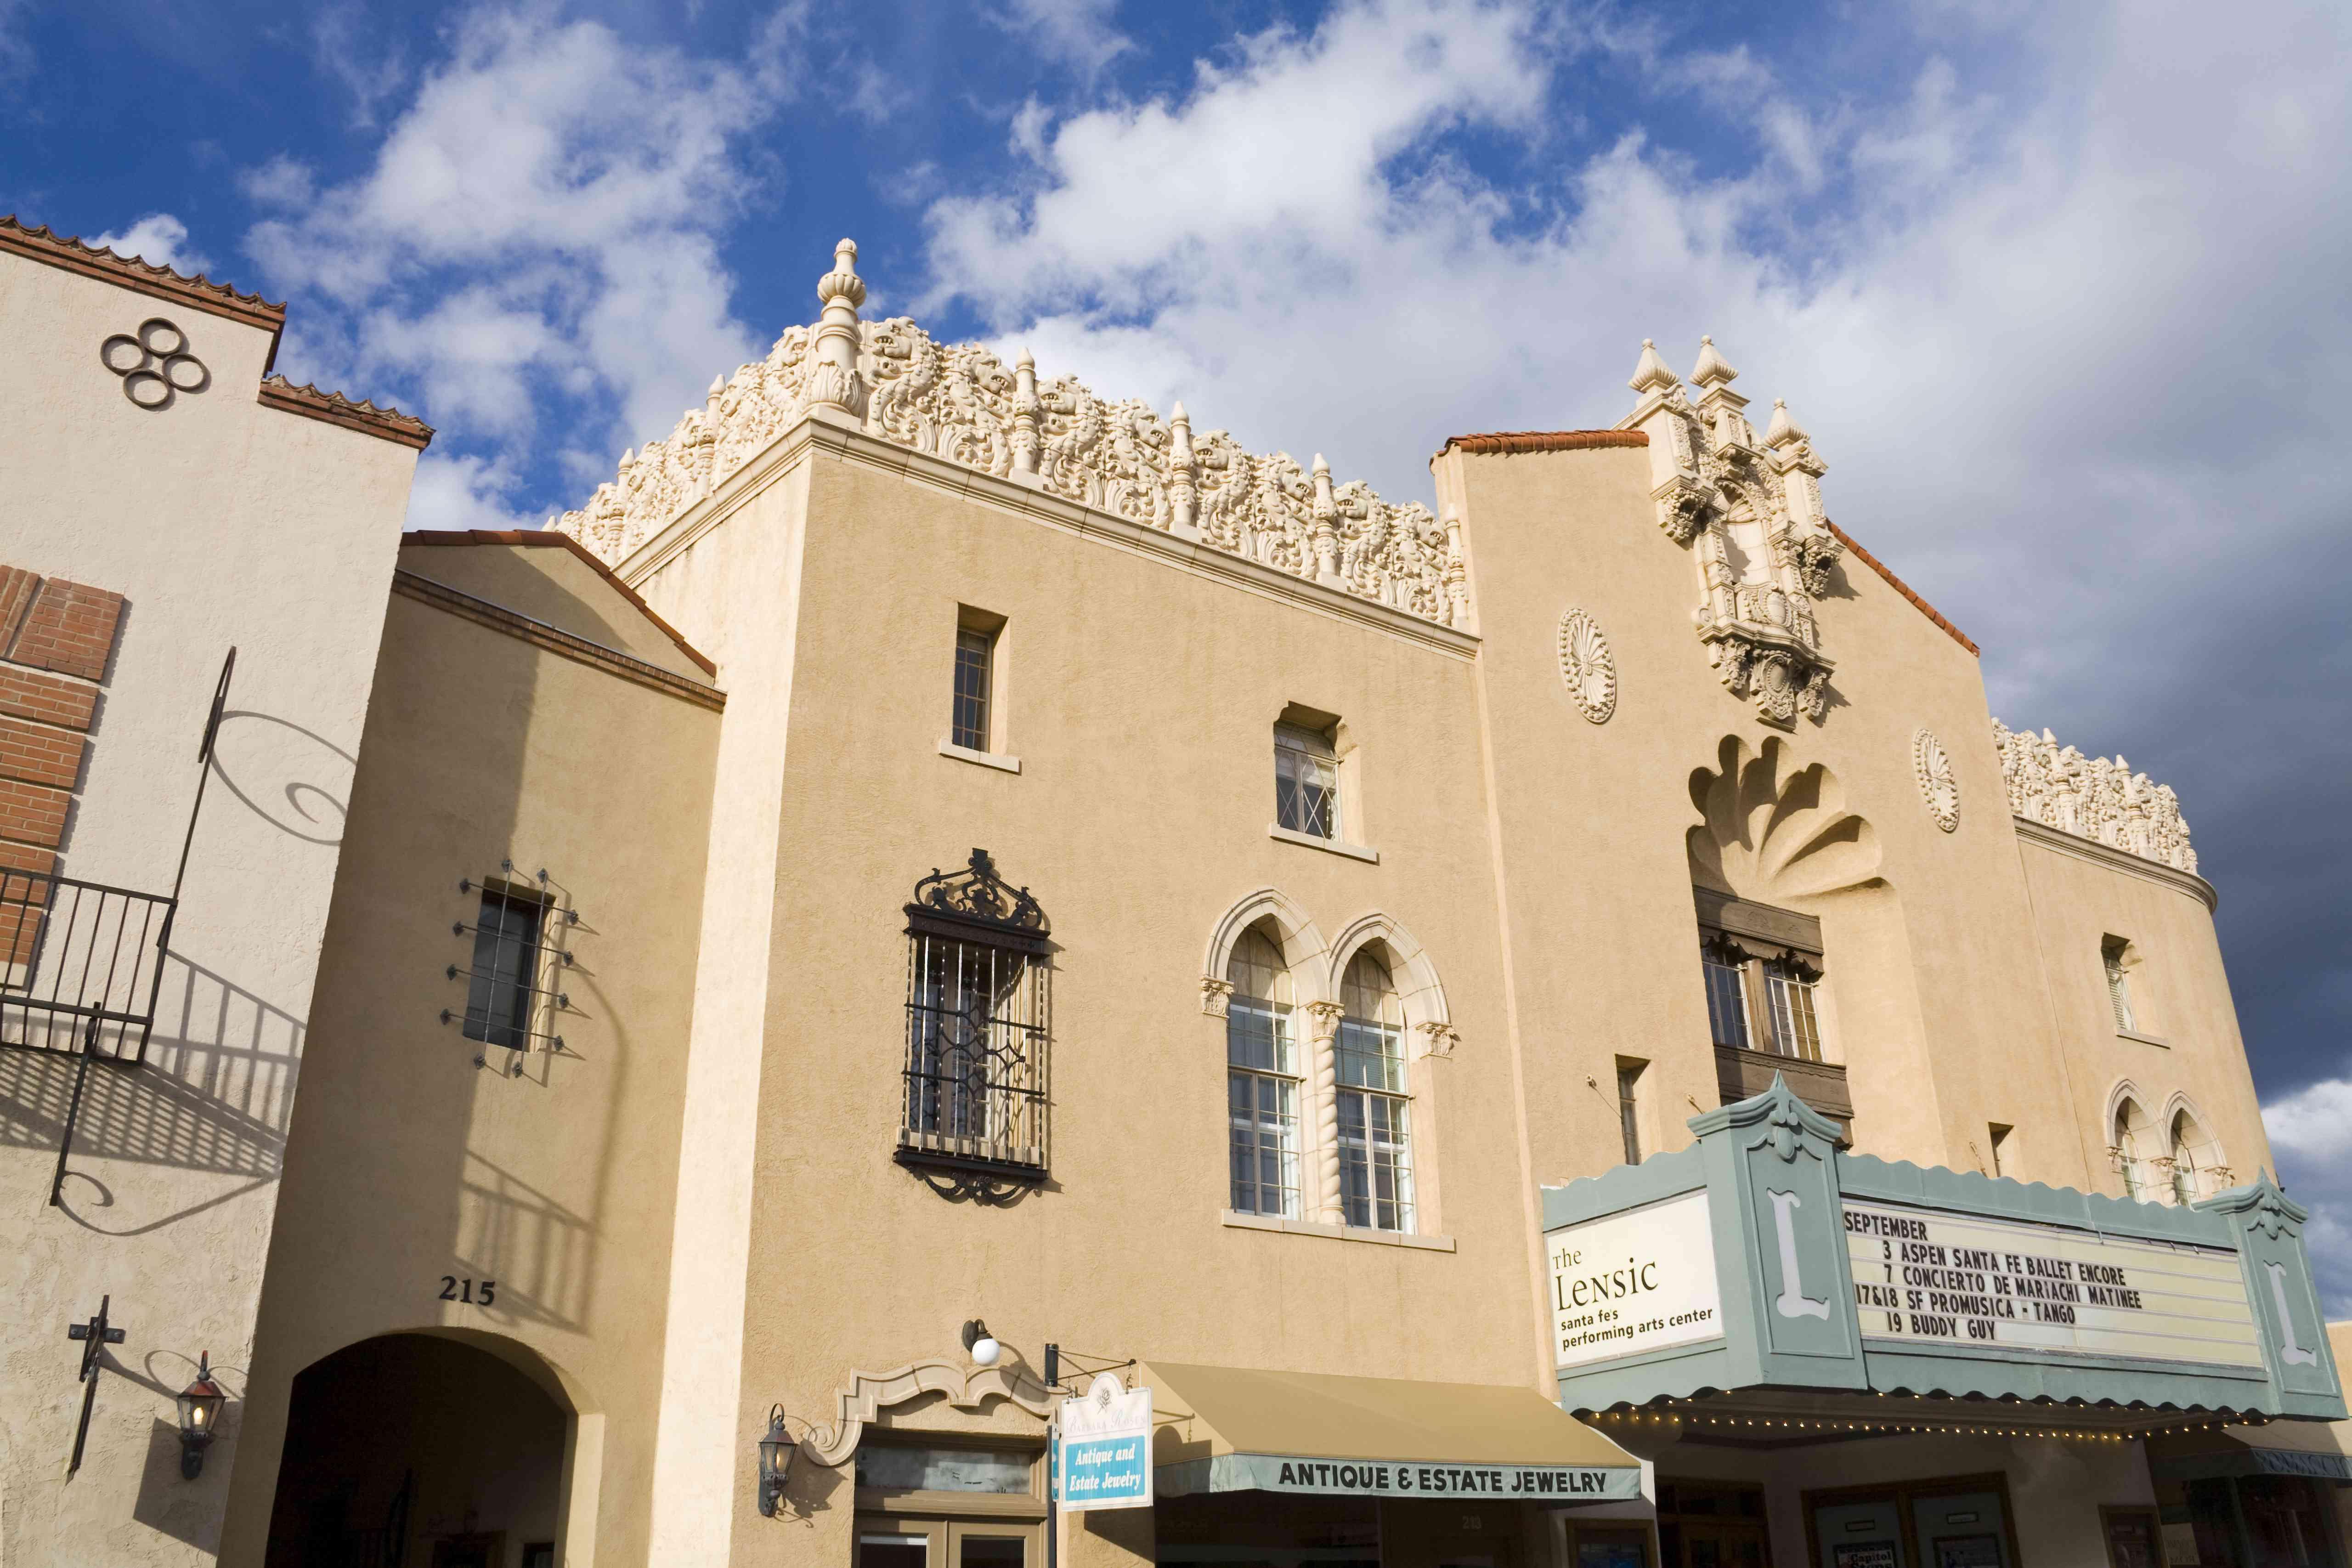 The Lensic Performing Arts Center in Santa Fe